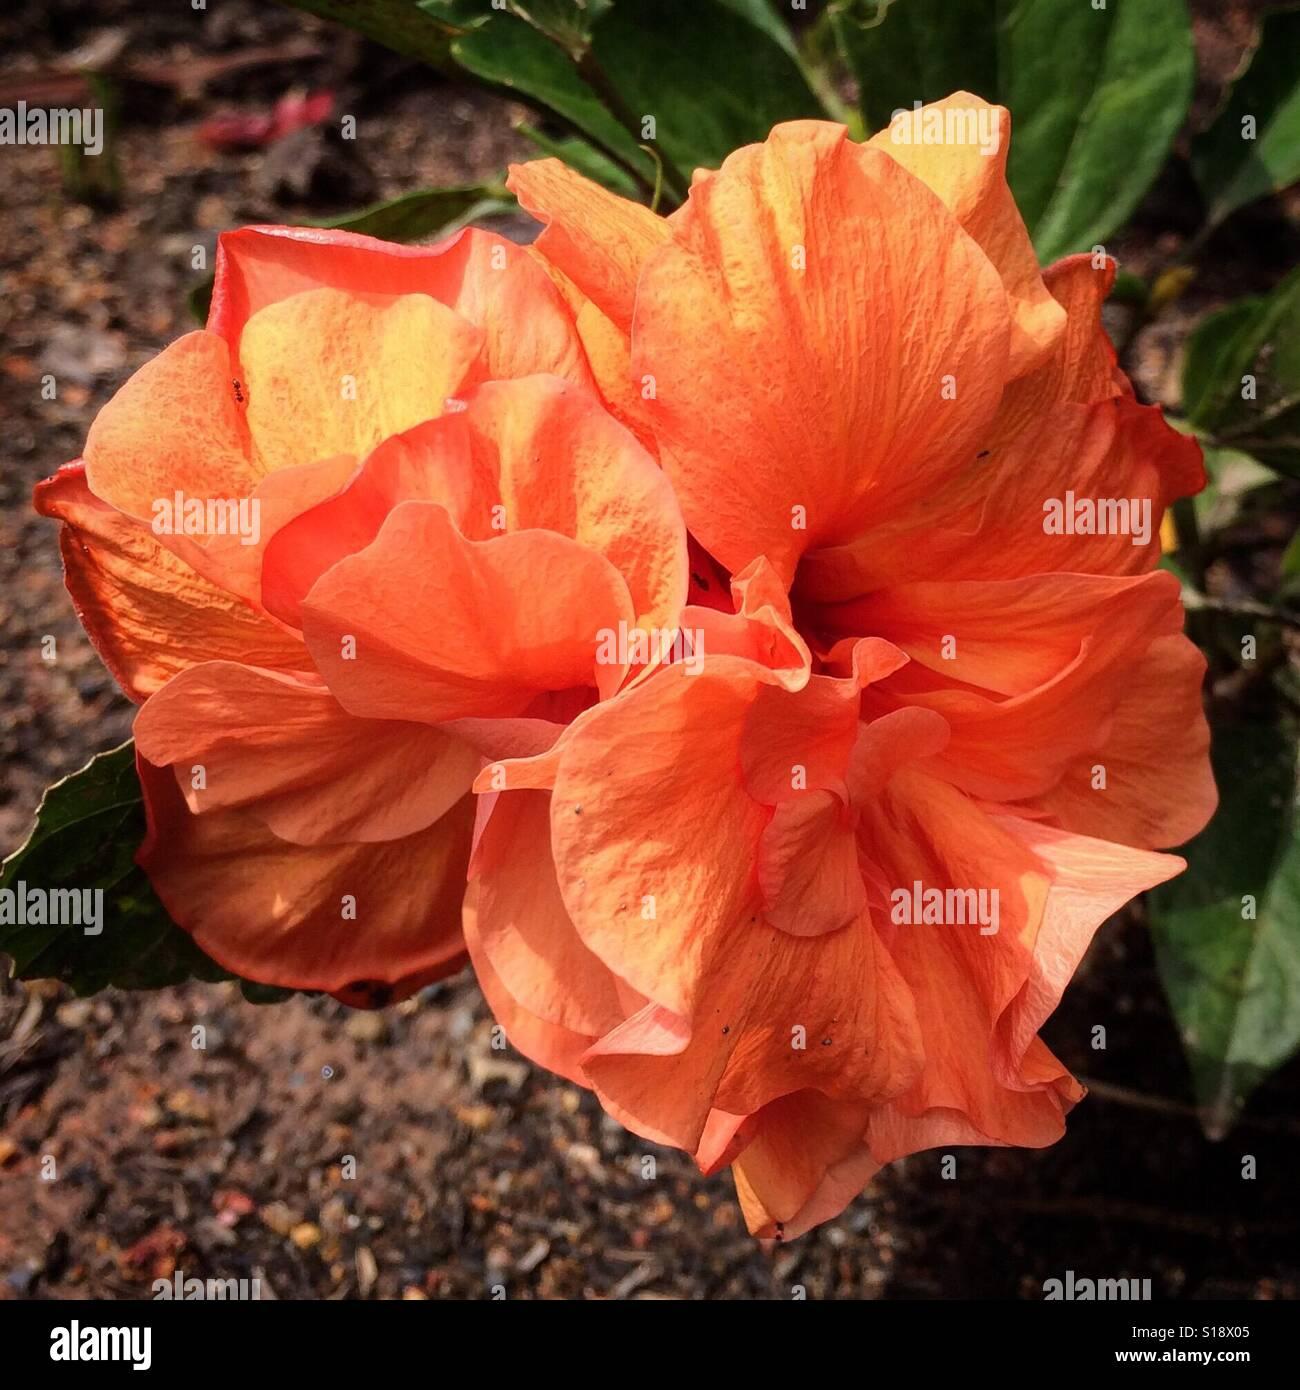 Tangerine Orange Double Hibiscus Flower In A Brazilian Garden Stock Photo 310597285 Alamy